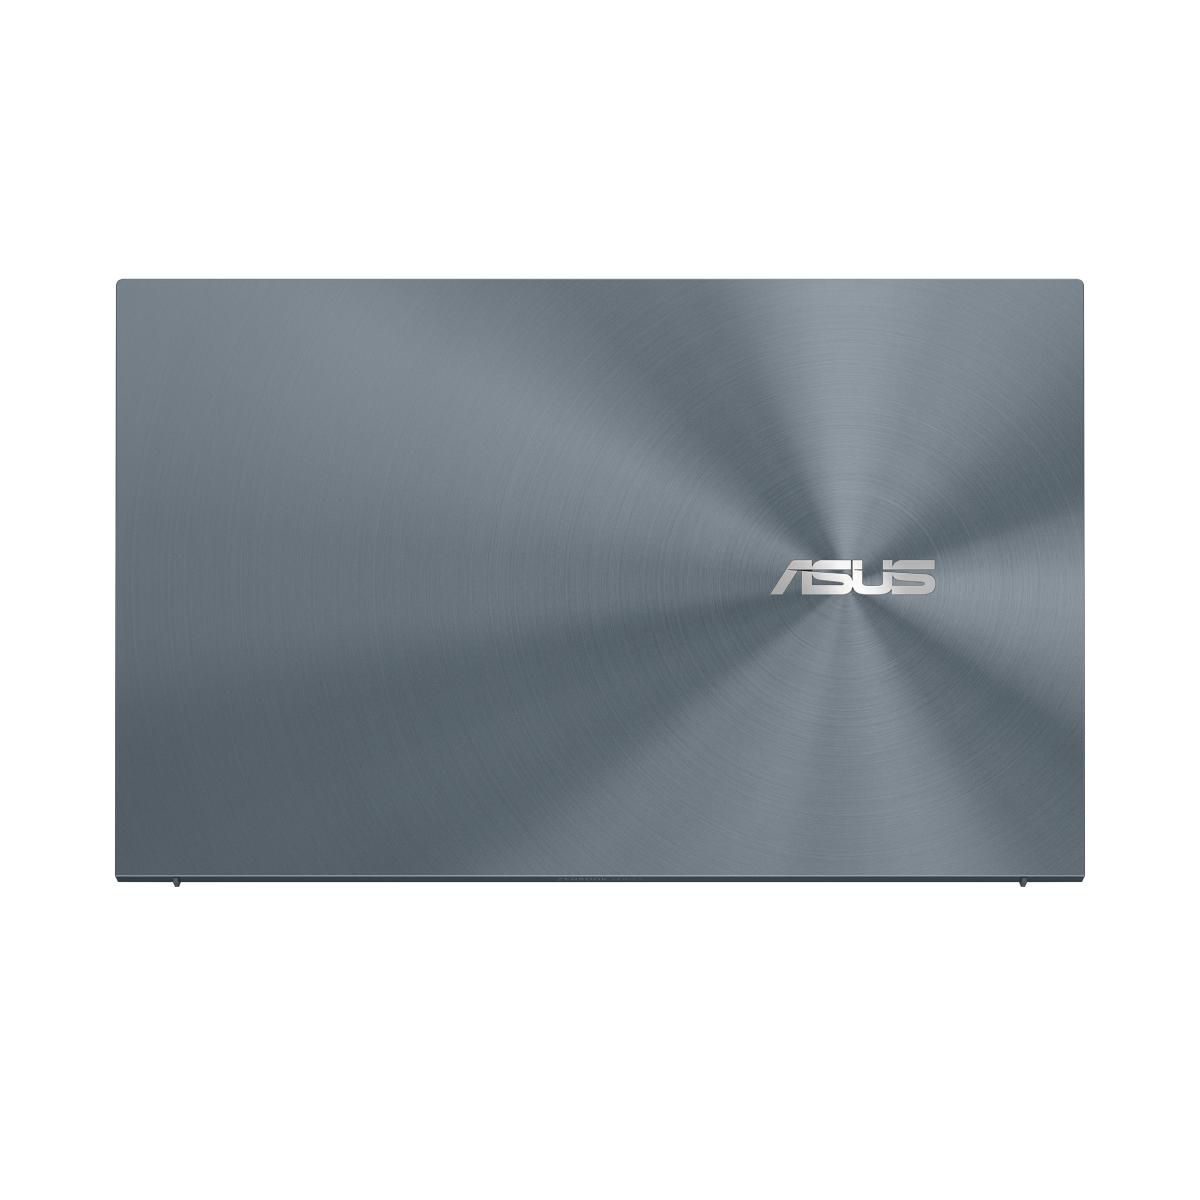 ASUS Zenbook 14 UX435EG